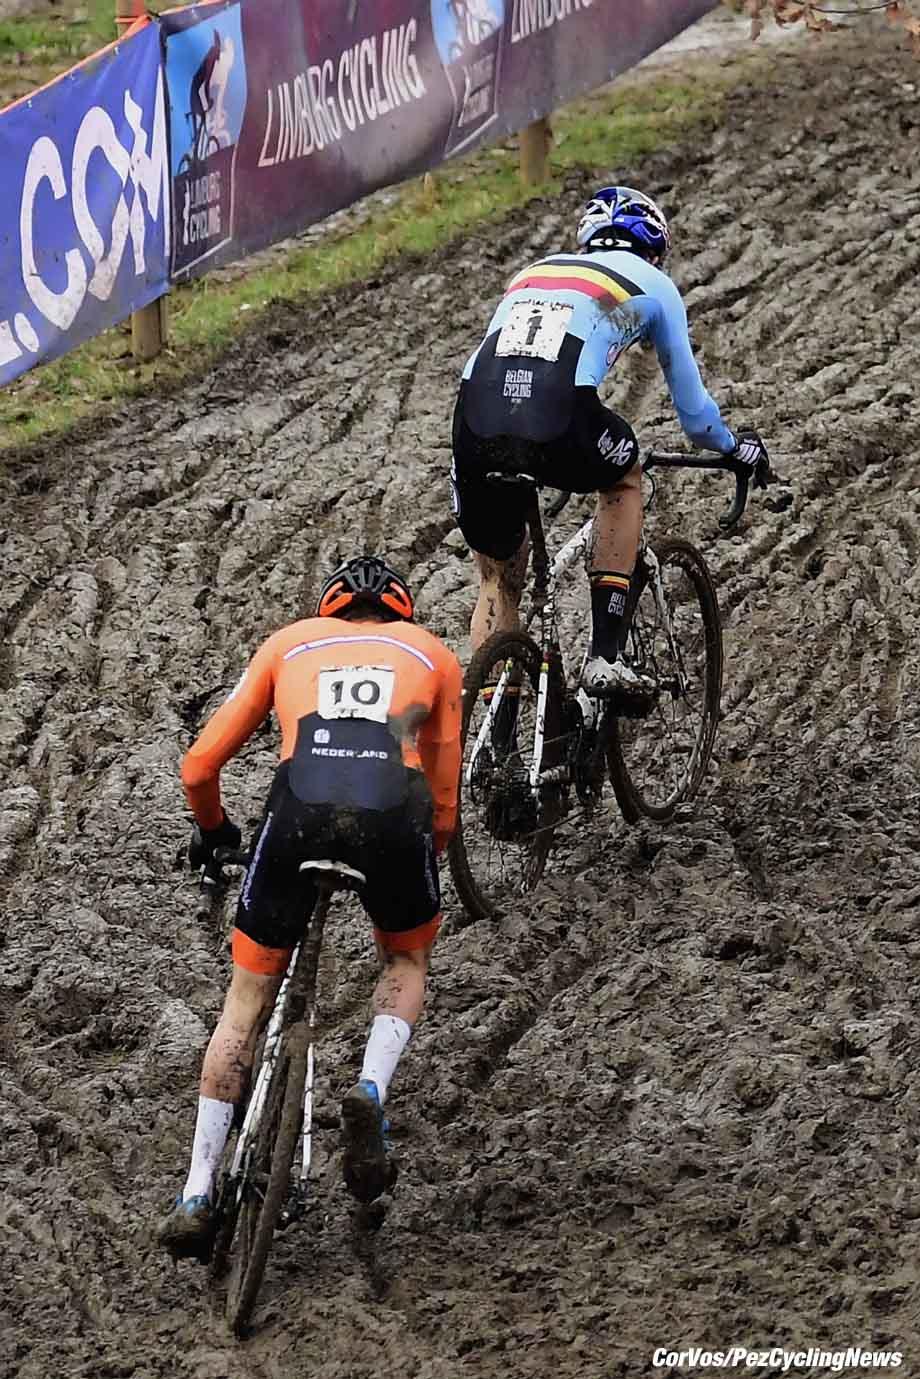 Valkenburg - Netherlands - wielrennen - Valkenburg - Netherlands - wielrennen - cycling - cyclisme - radsport - Van Der Poel Mathieu (NED) of Corendon - Circus in front of Van Aert Wout (BEL) of Crelan - Charles team pictured during the World Championships Cyclocross for elite men in Valkenburg, Netherlands - photo PN/Cor Vos © 2018